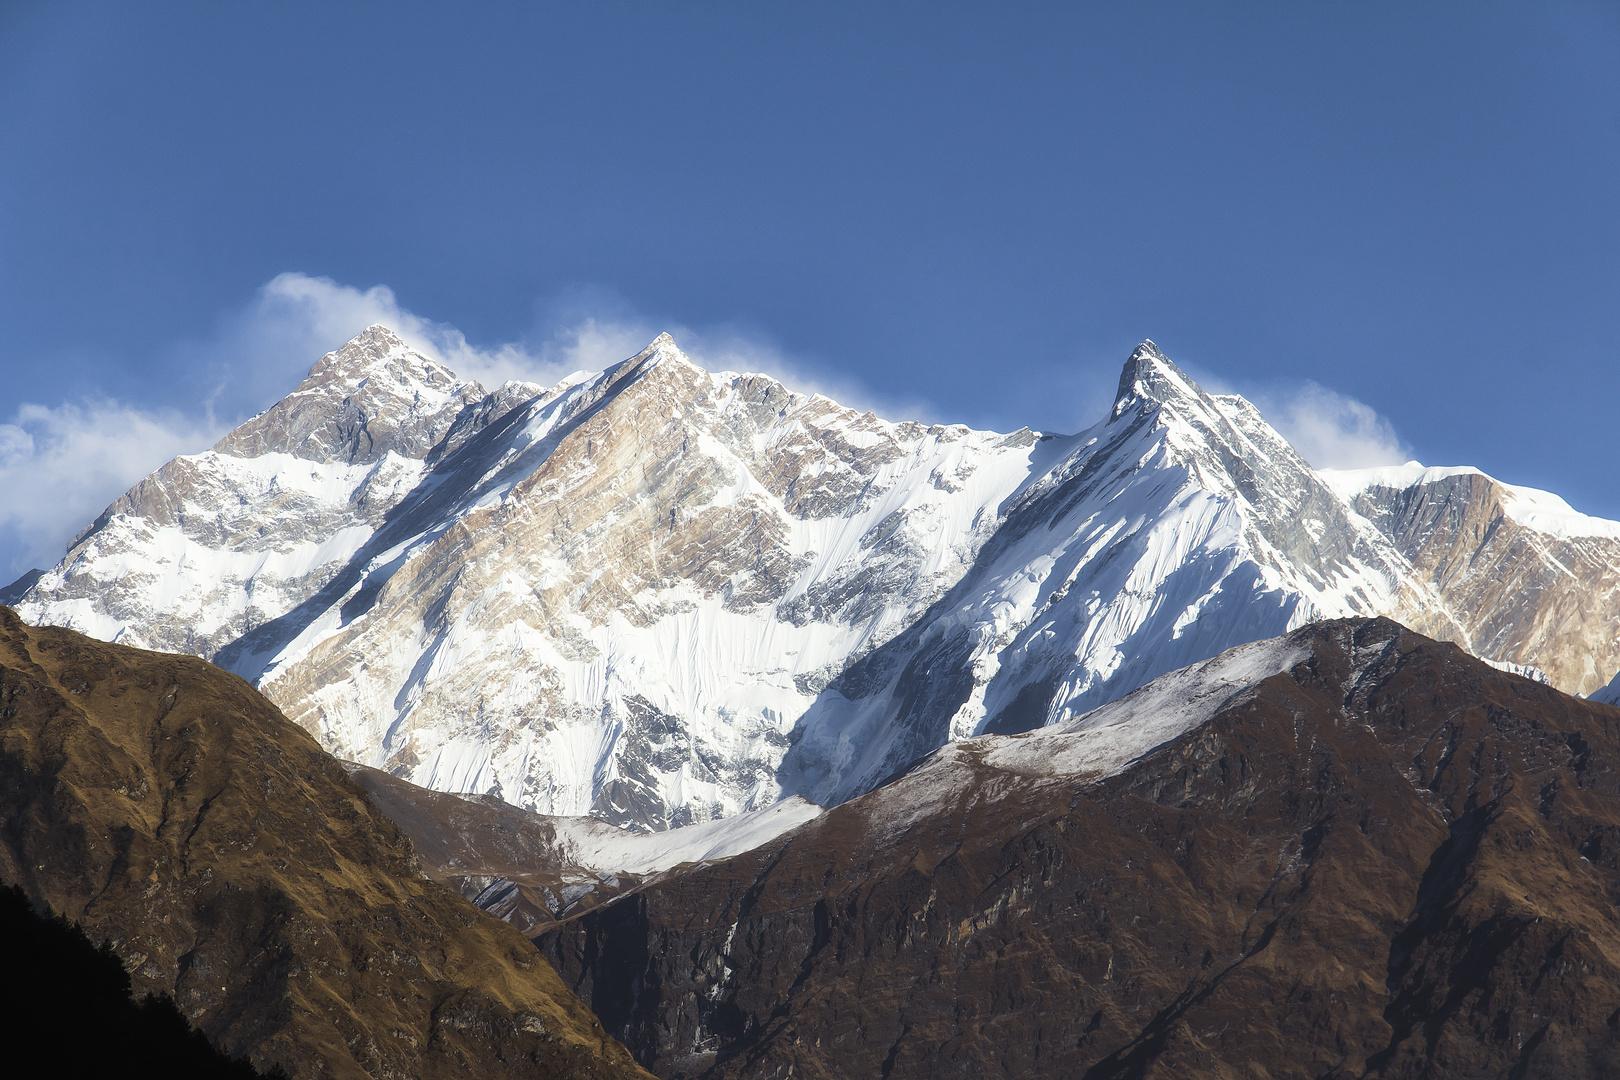 Annapurna 1 8091